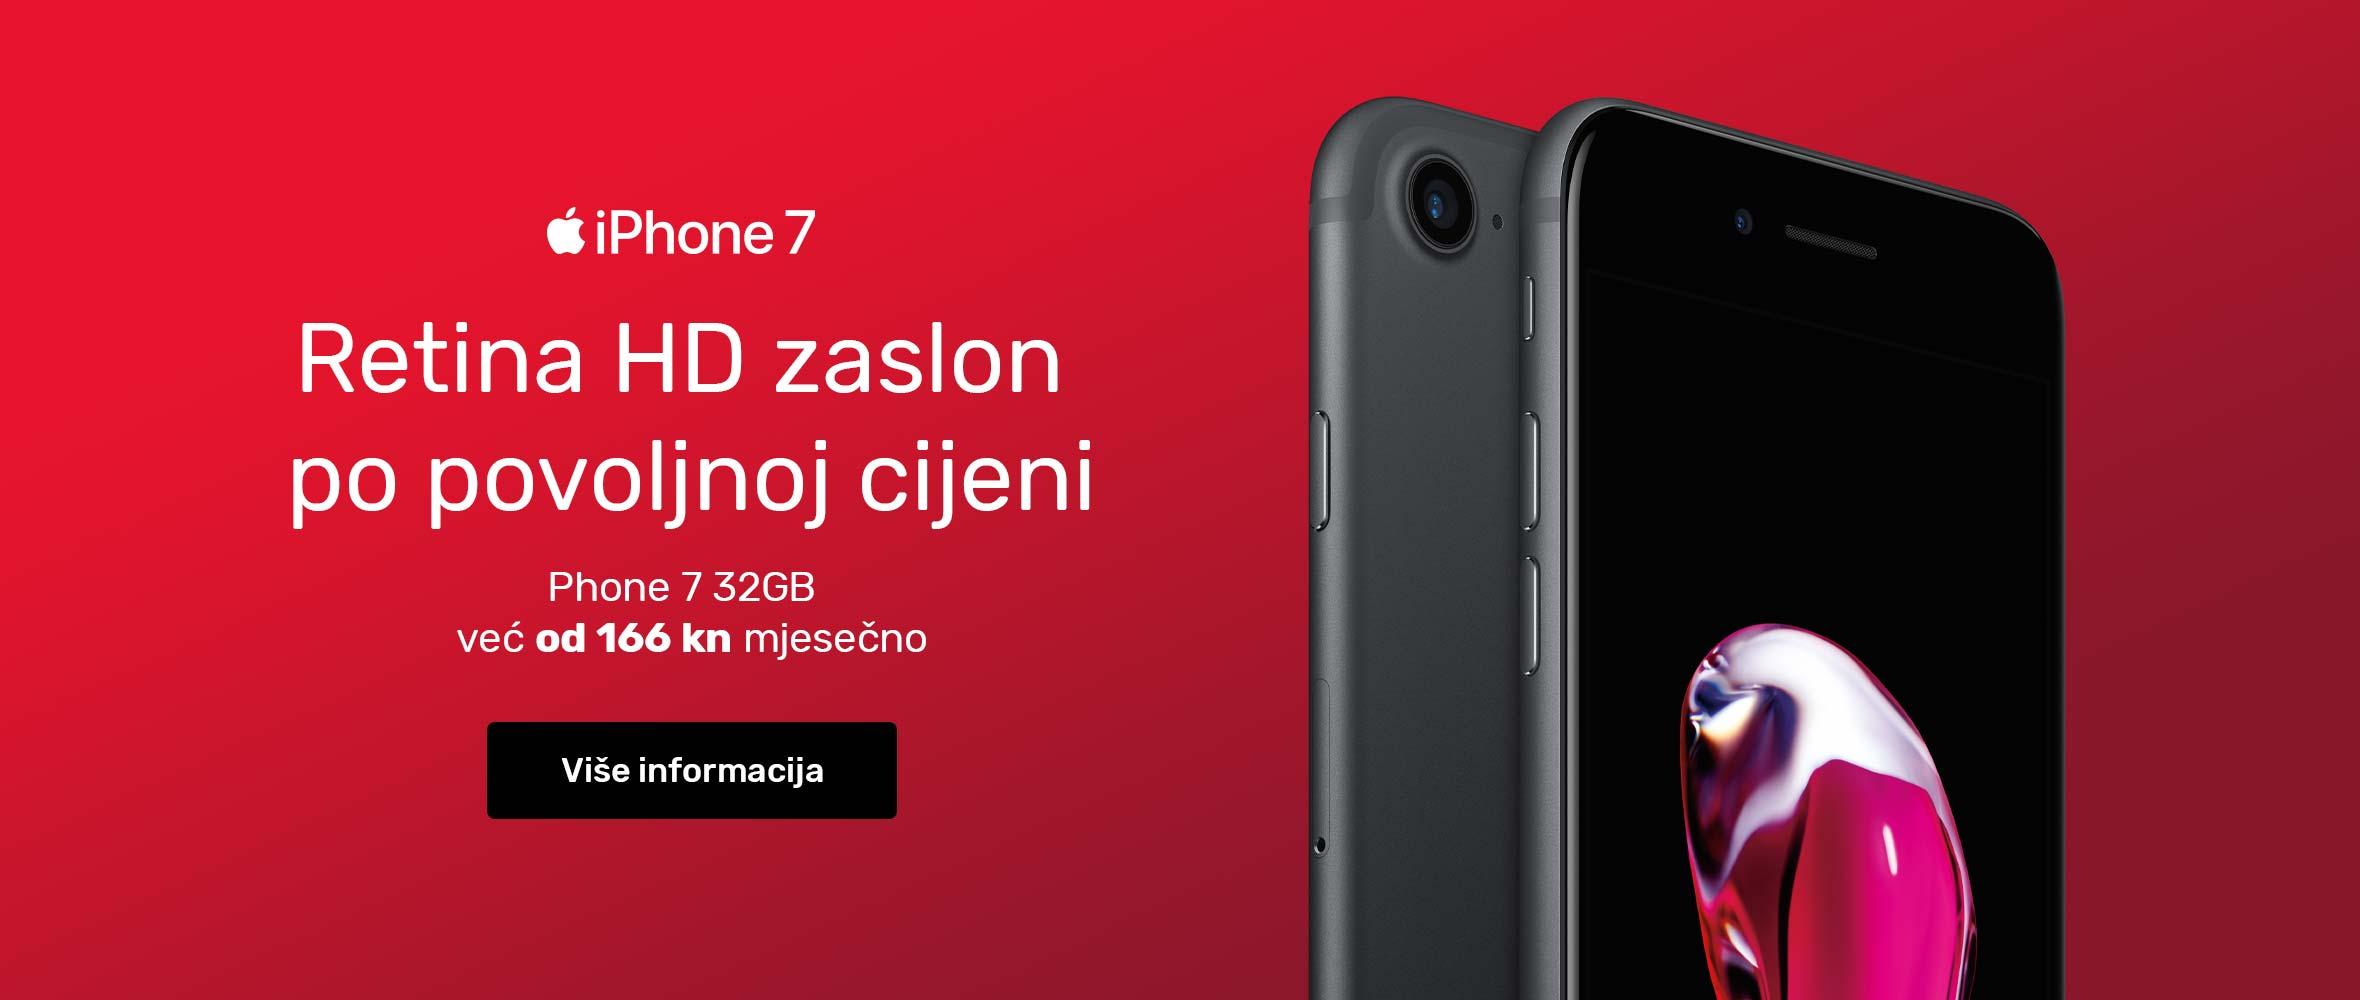 iPhone 7 3999